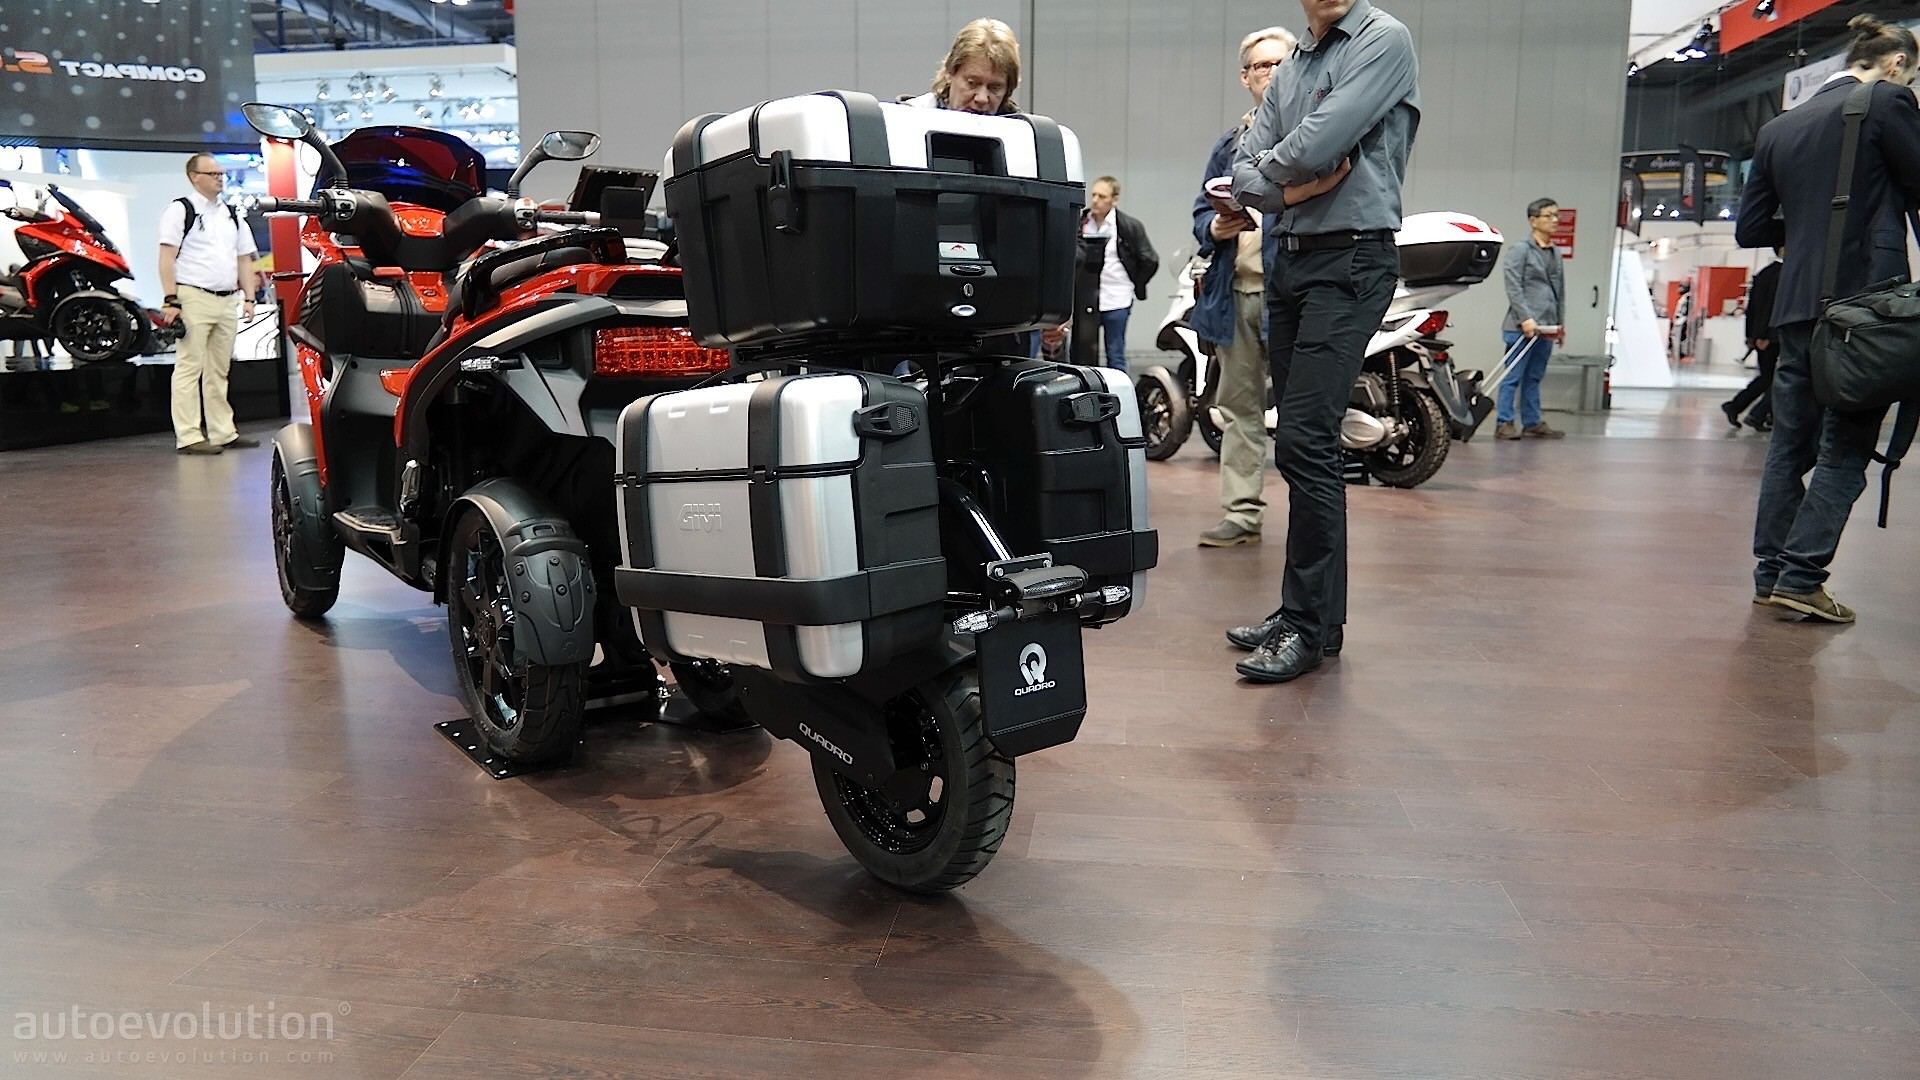 Eicma Quadro Big Q Becomes Smart And Rugged Autoevolution